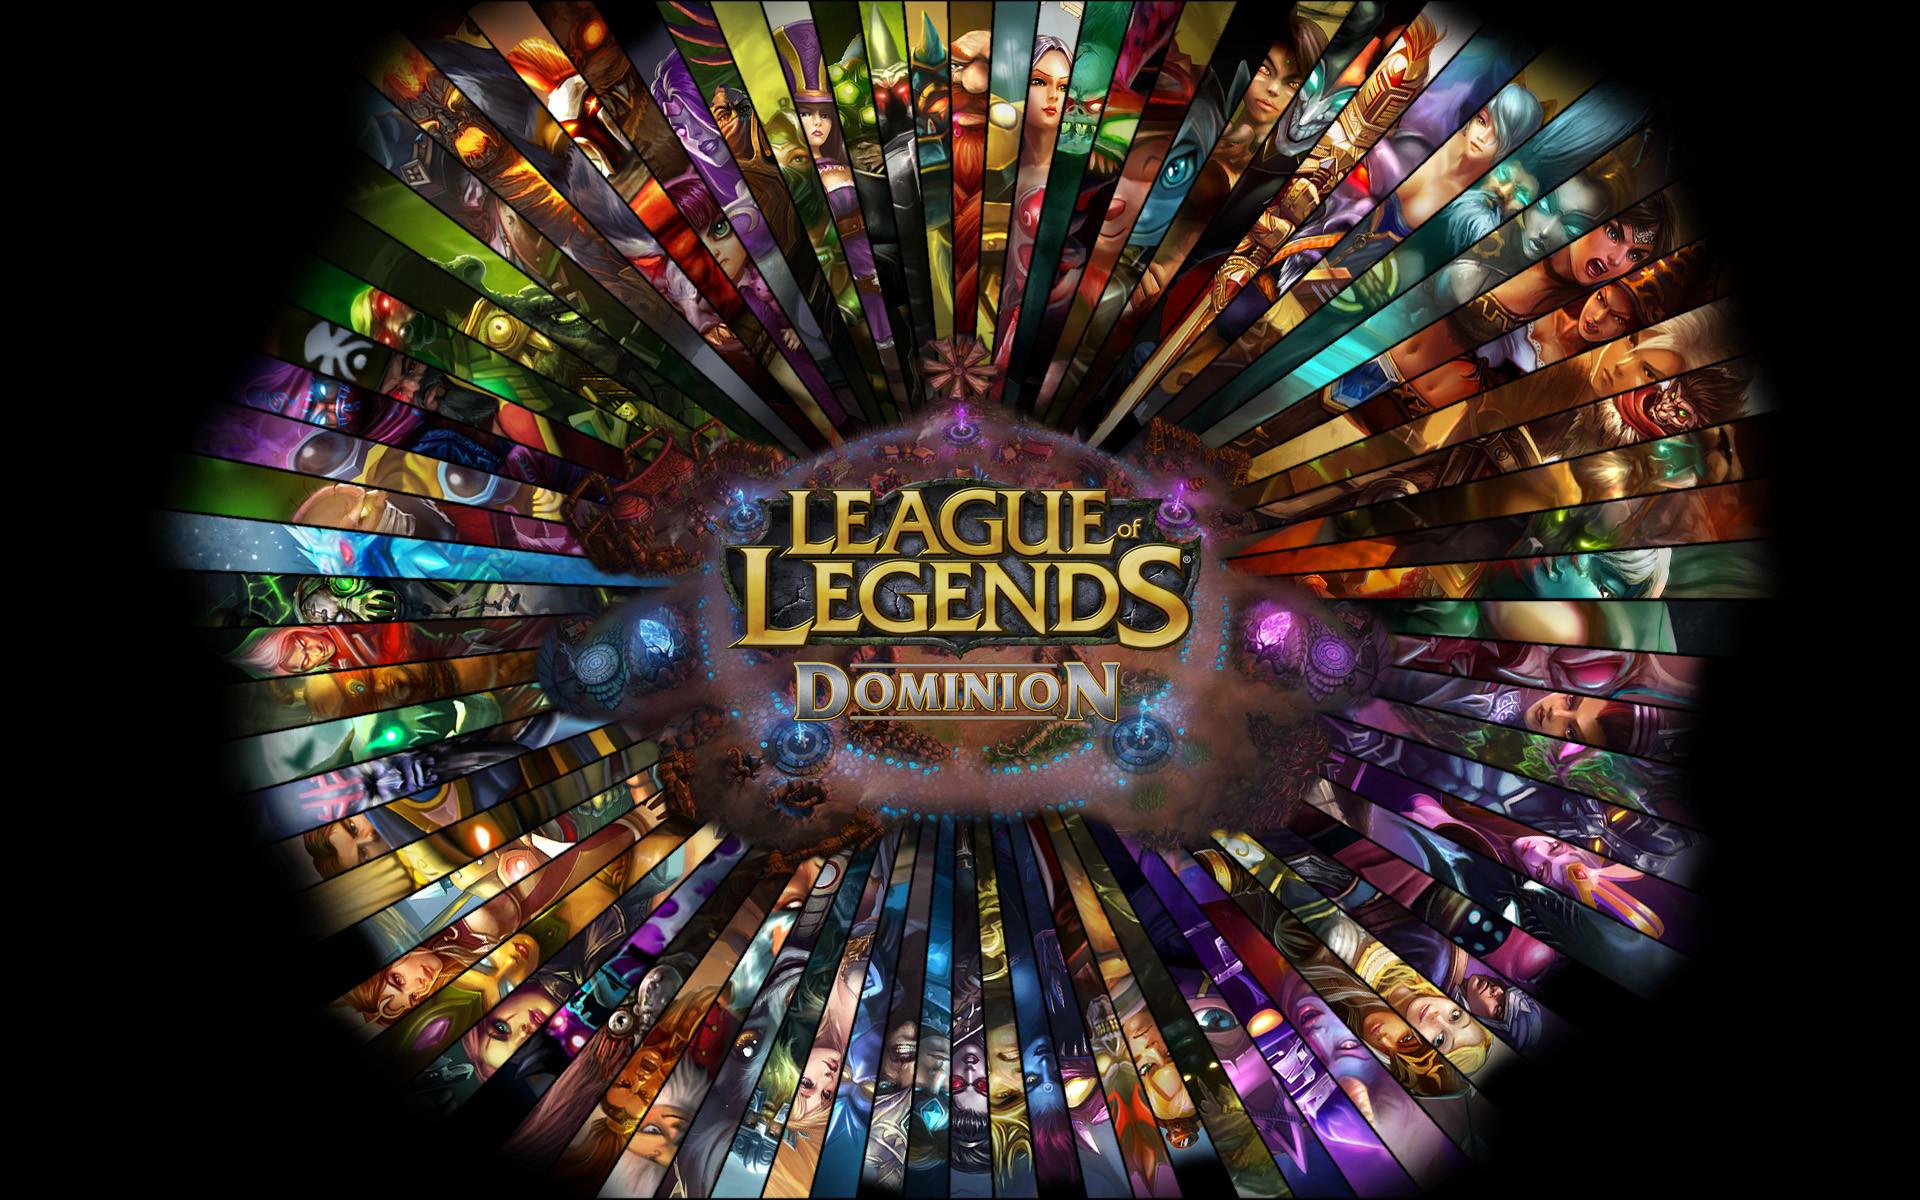 League of Legends Dominion wallpaper